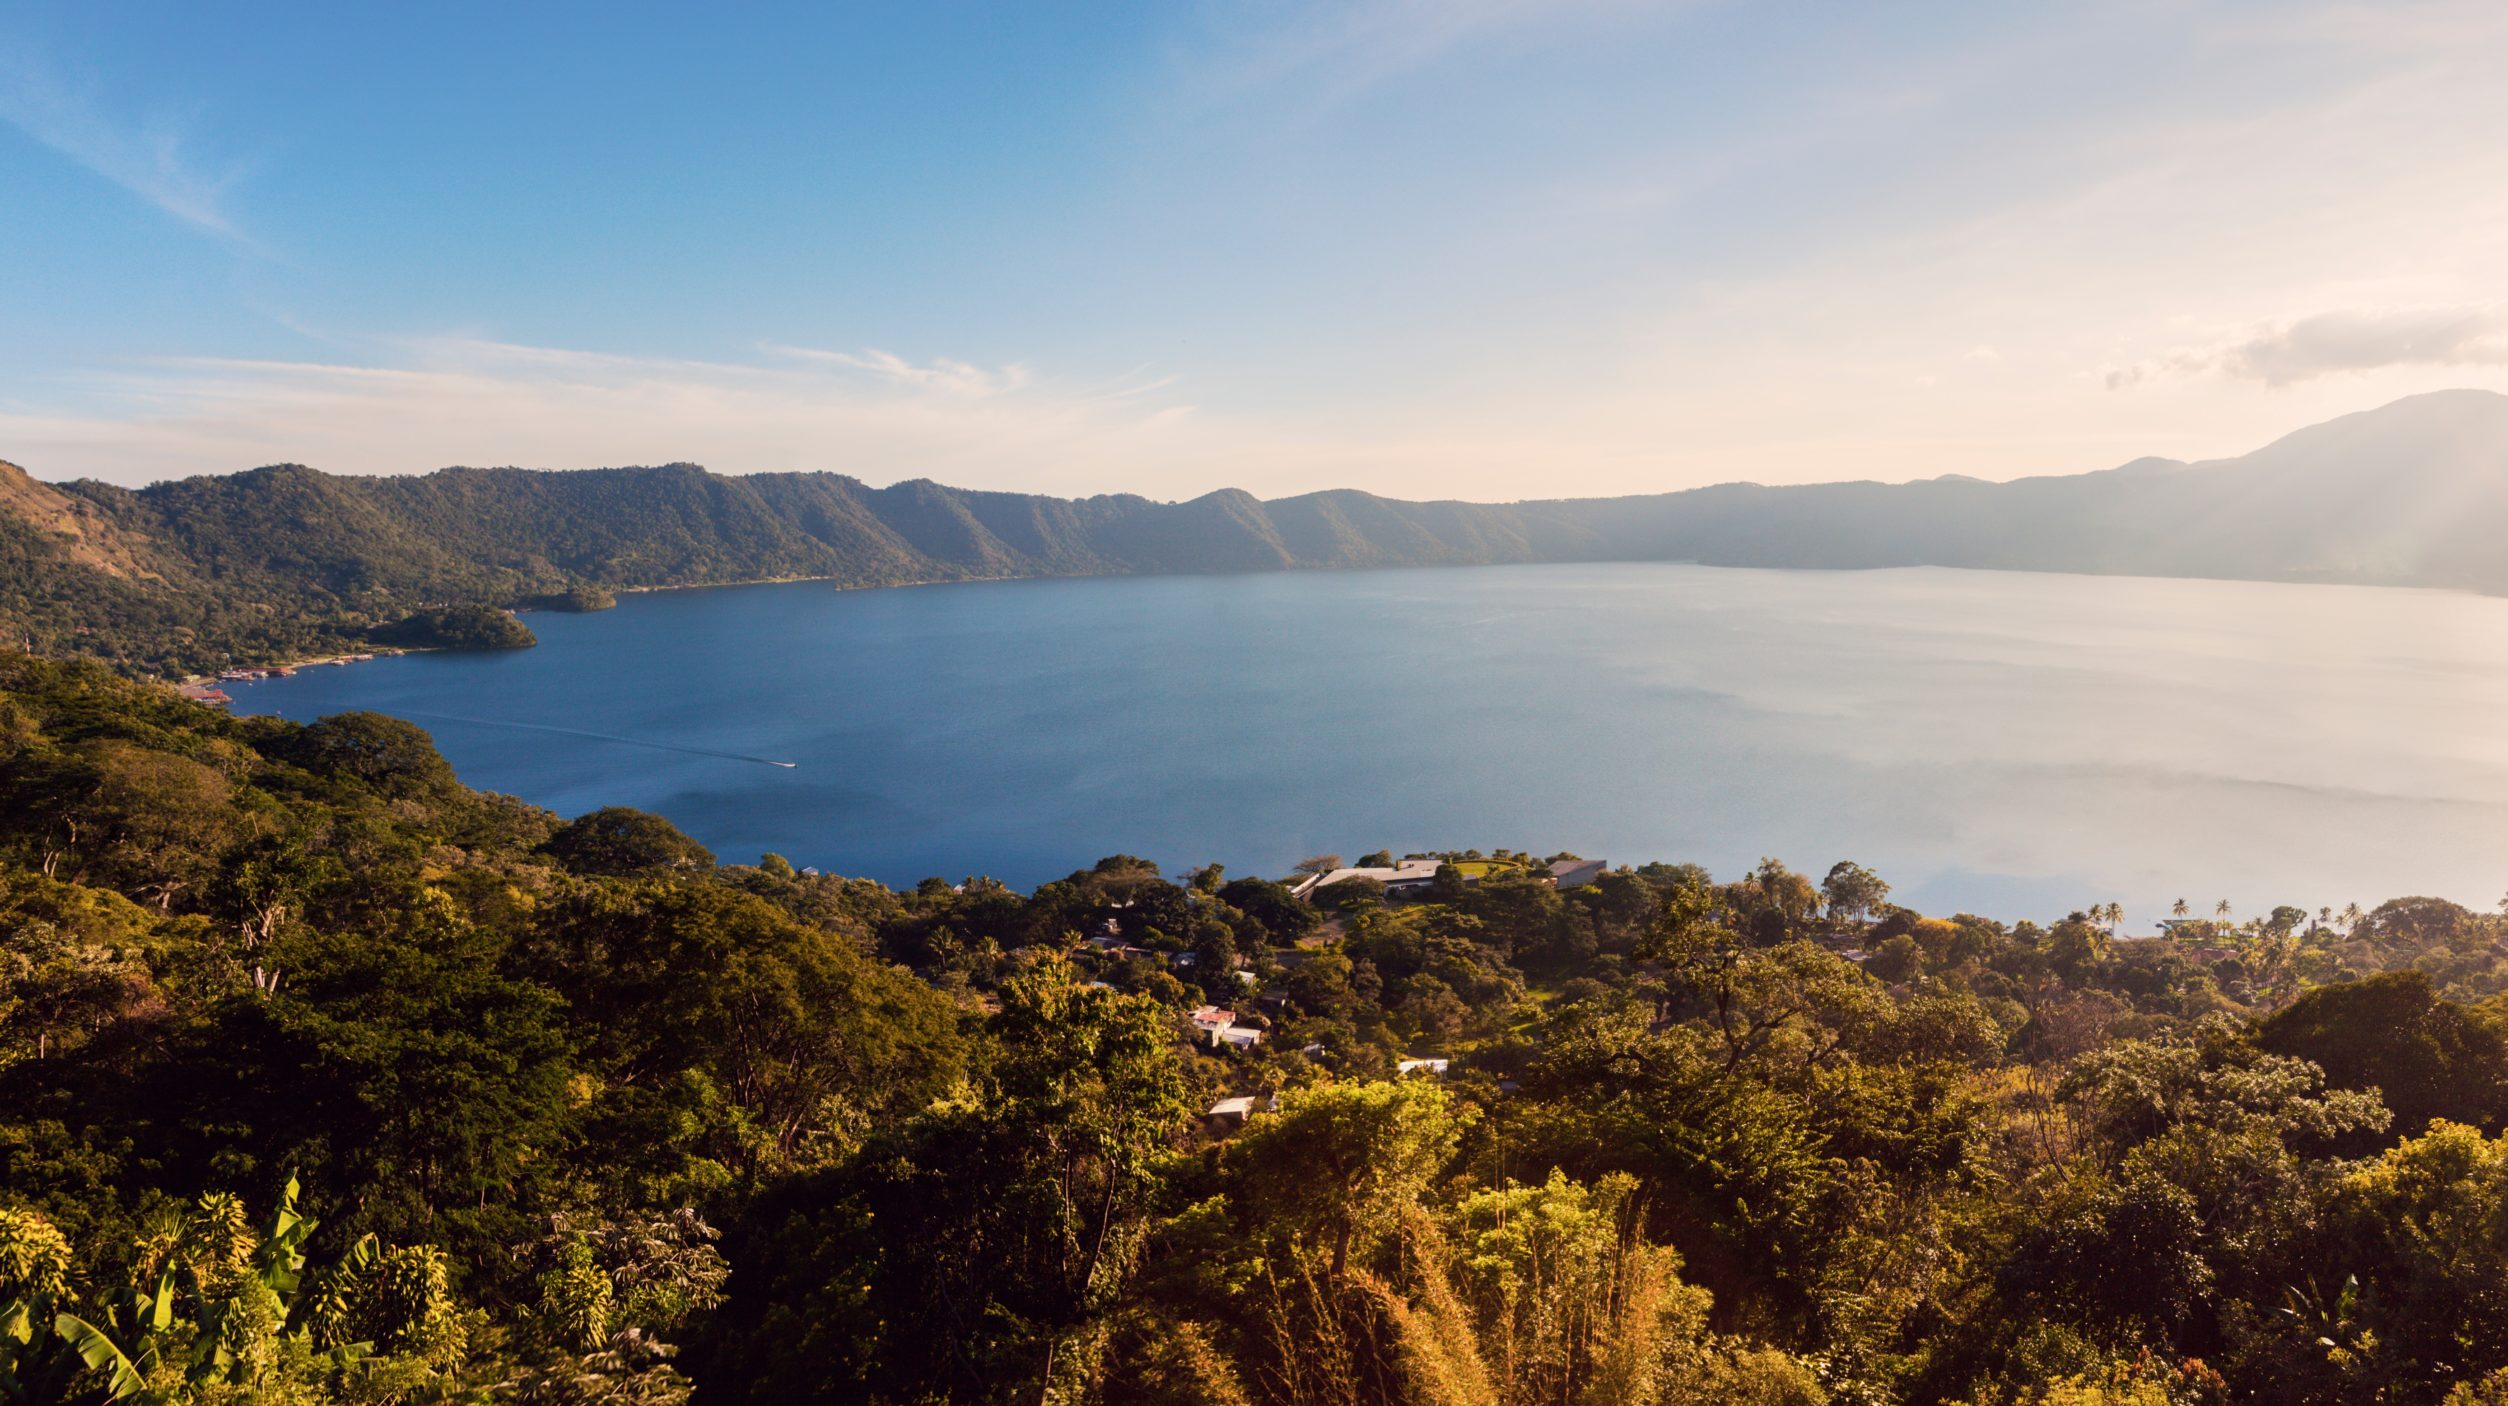 El Salvador [Shutterstock]